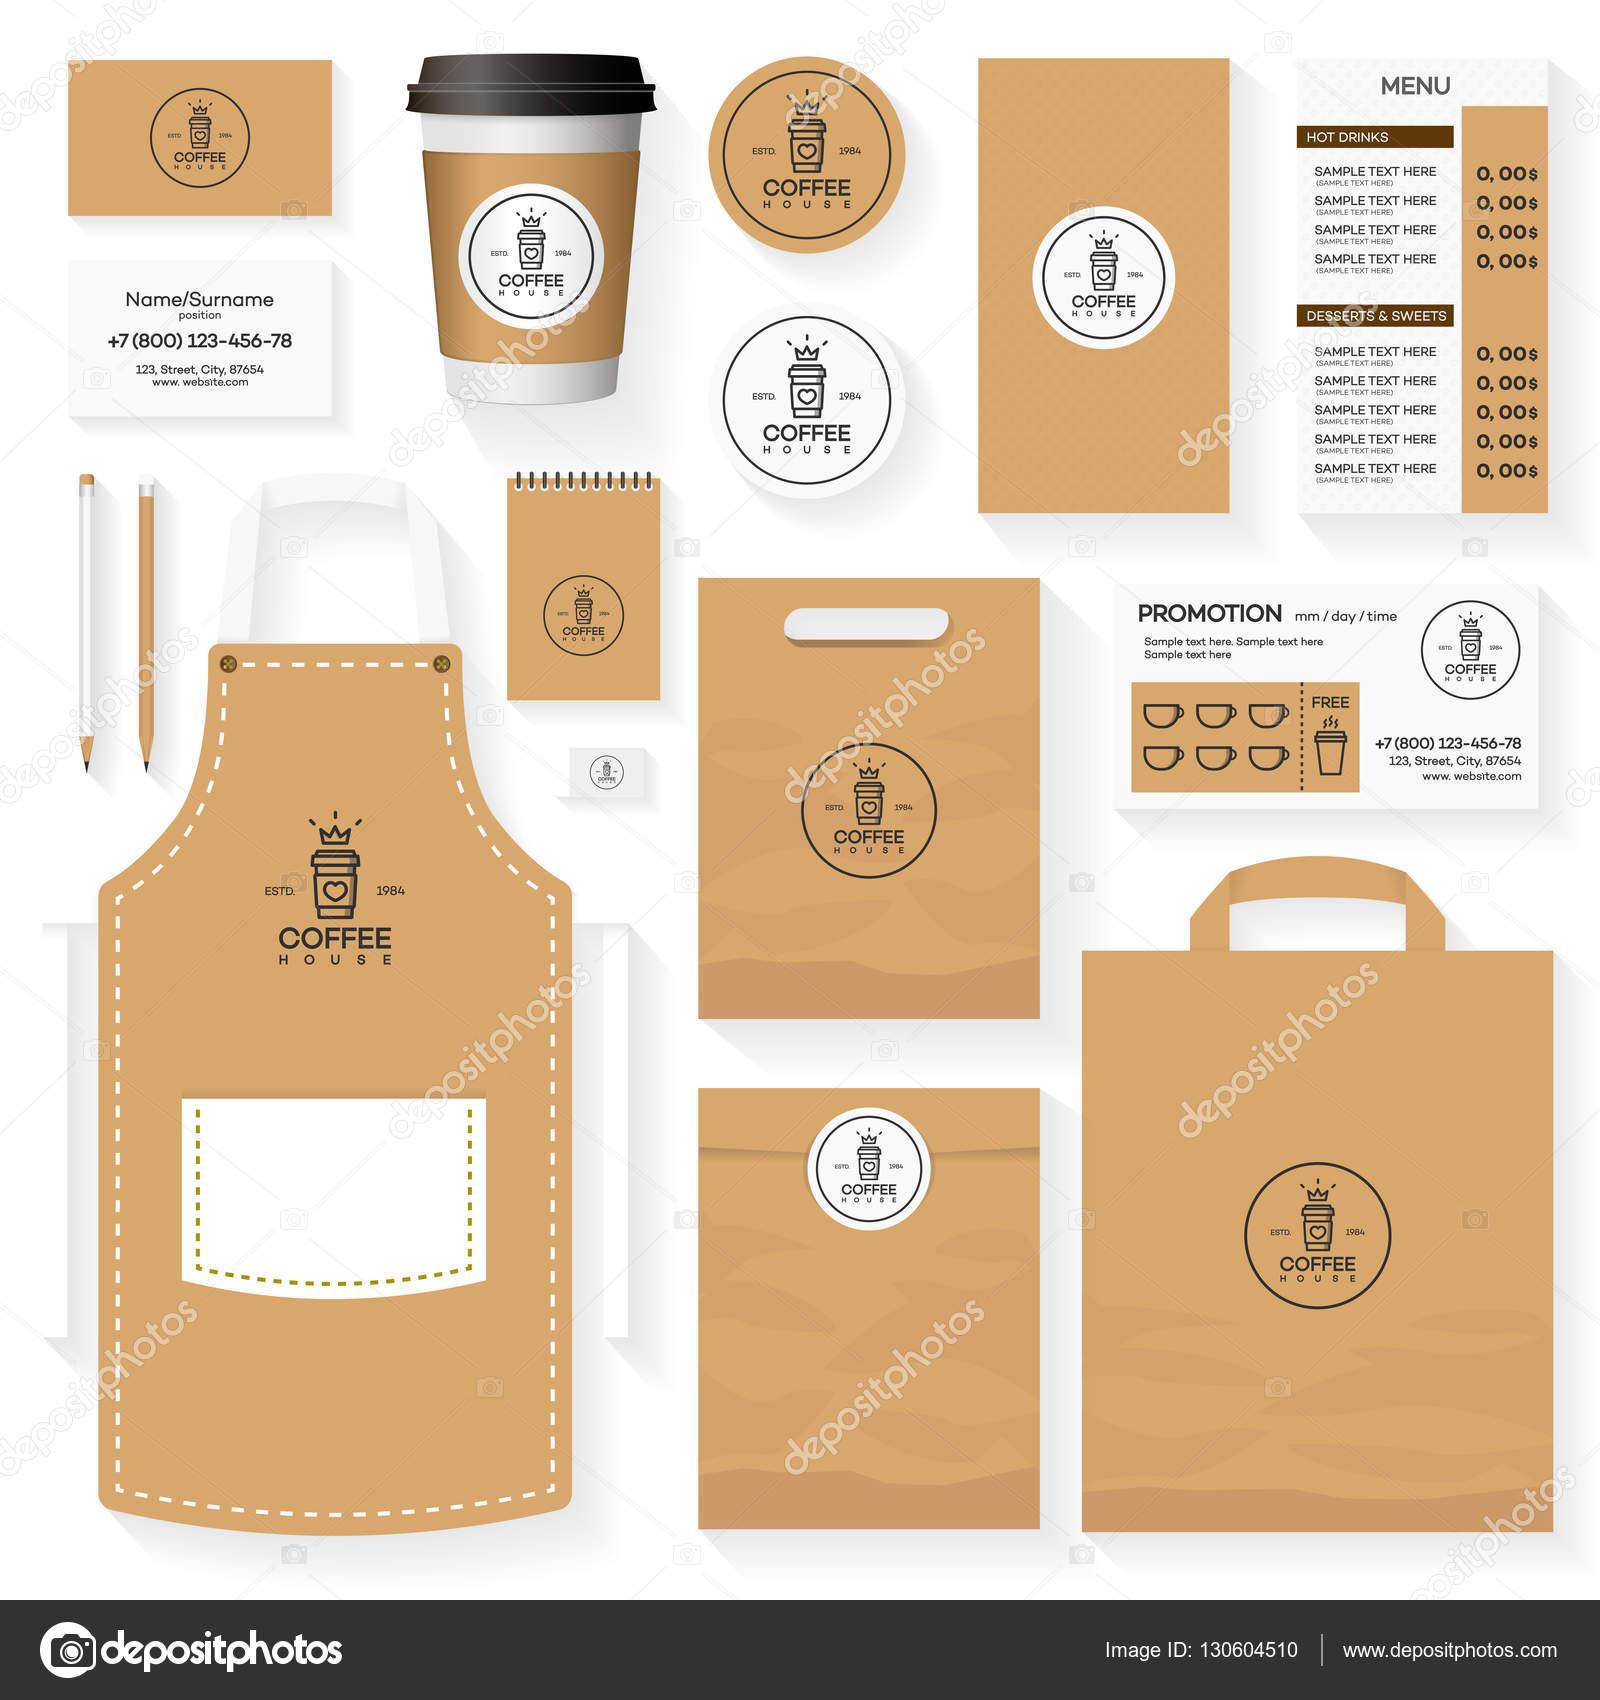 Corporate uniform Stock Vectors Royalty Free Corporate uniform